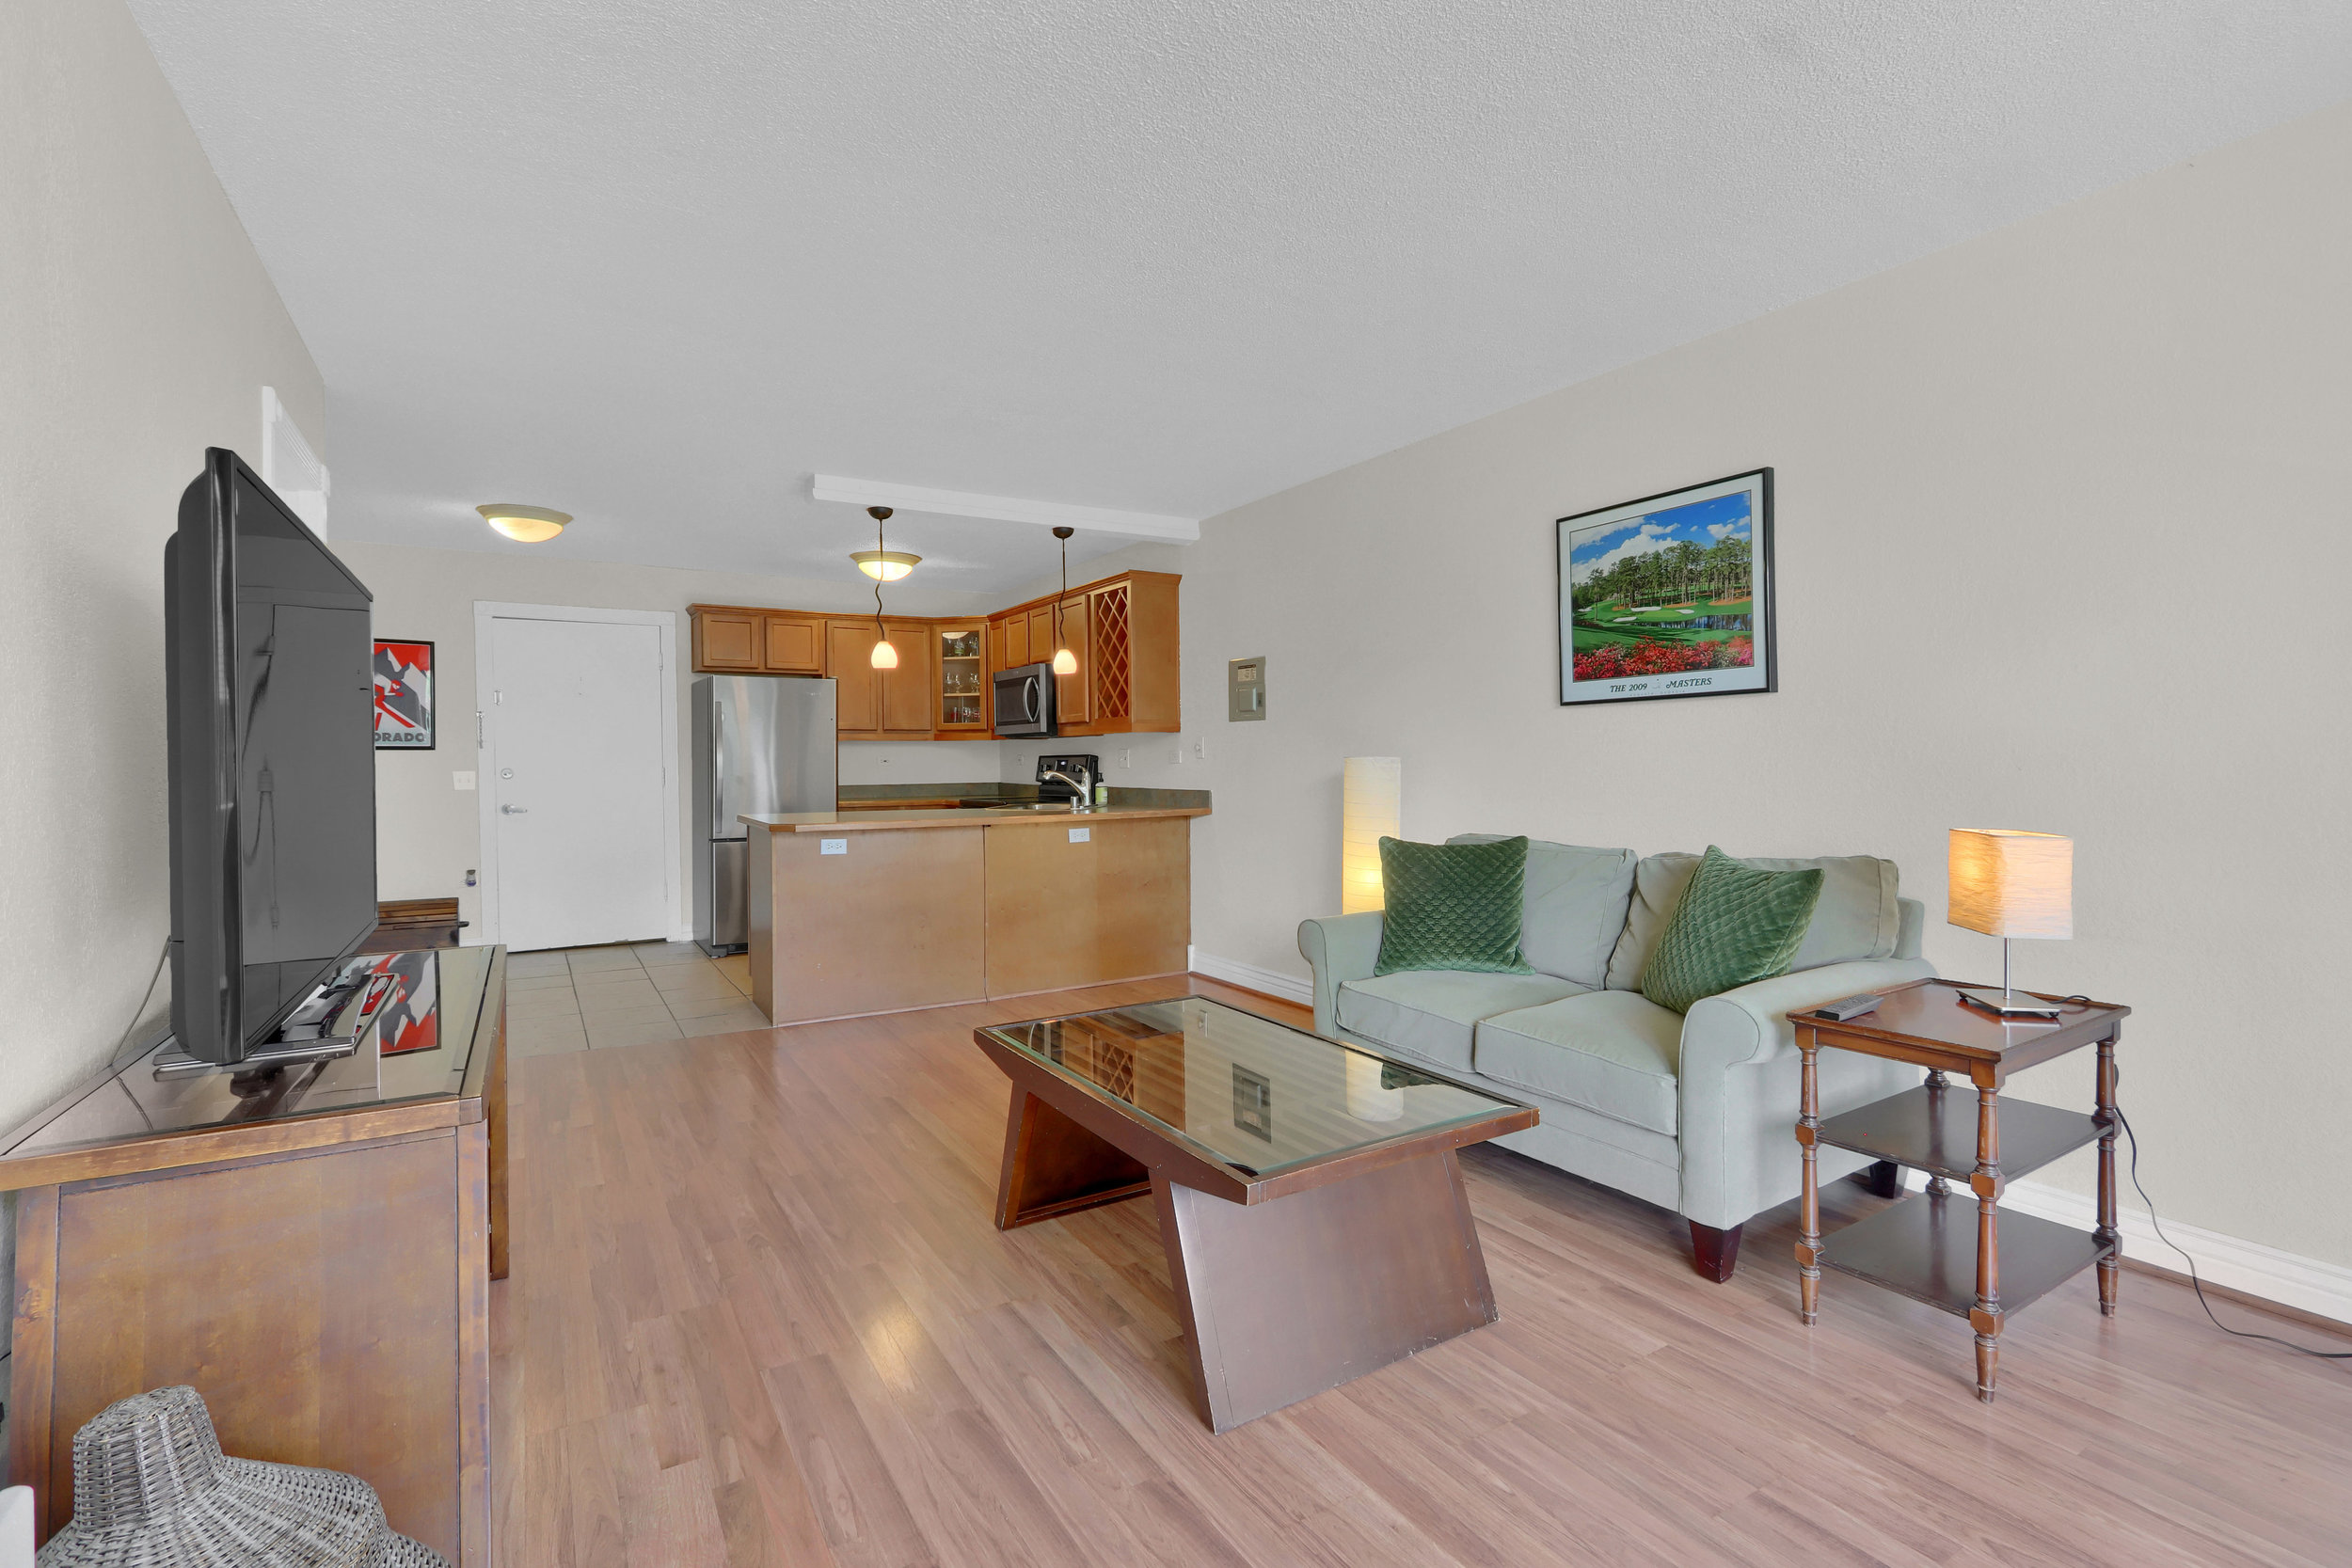 909 N Logan St Unit 3J Denver-print-011-013-Living Room-4200x2800-300dpi.jpg